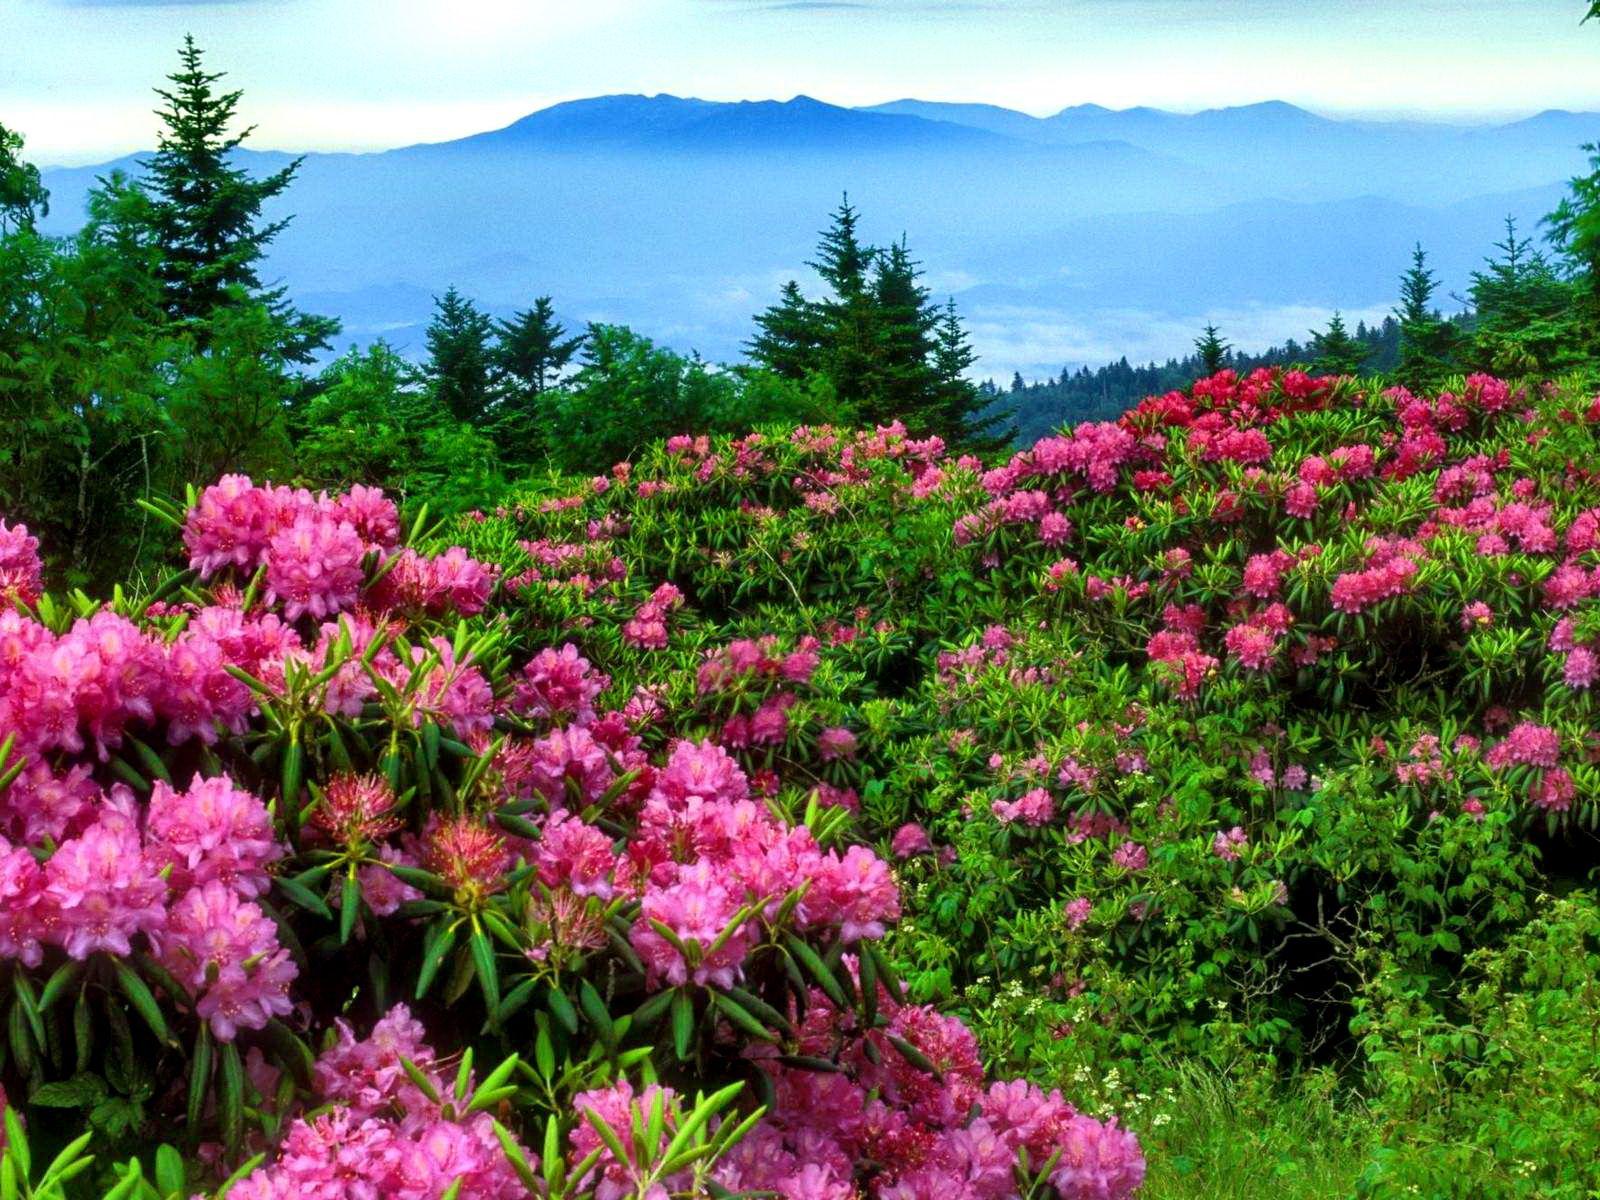 Beautiful Wallpaper Mountain Flower - e2f9f34140e2b6971dcdaa6b35cf24bd  Perfect Image Reference_85632.jpg